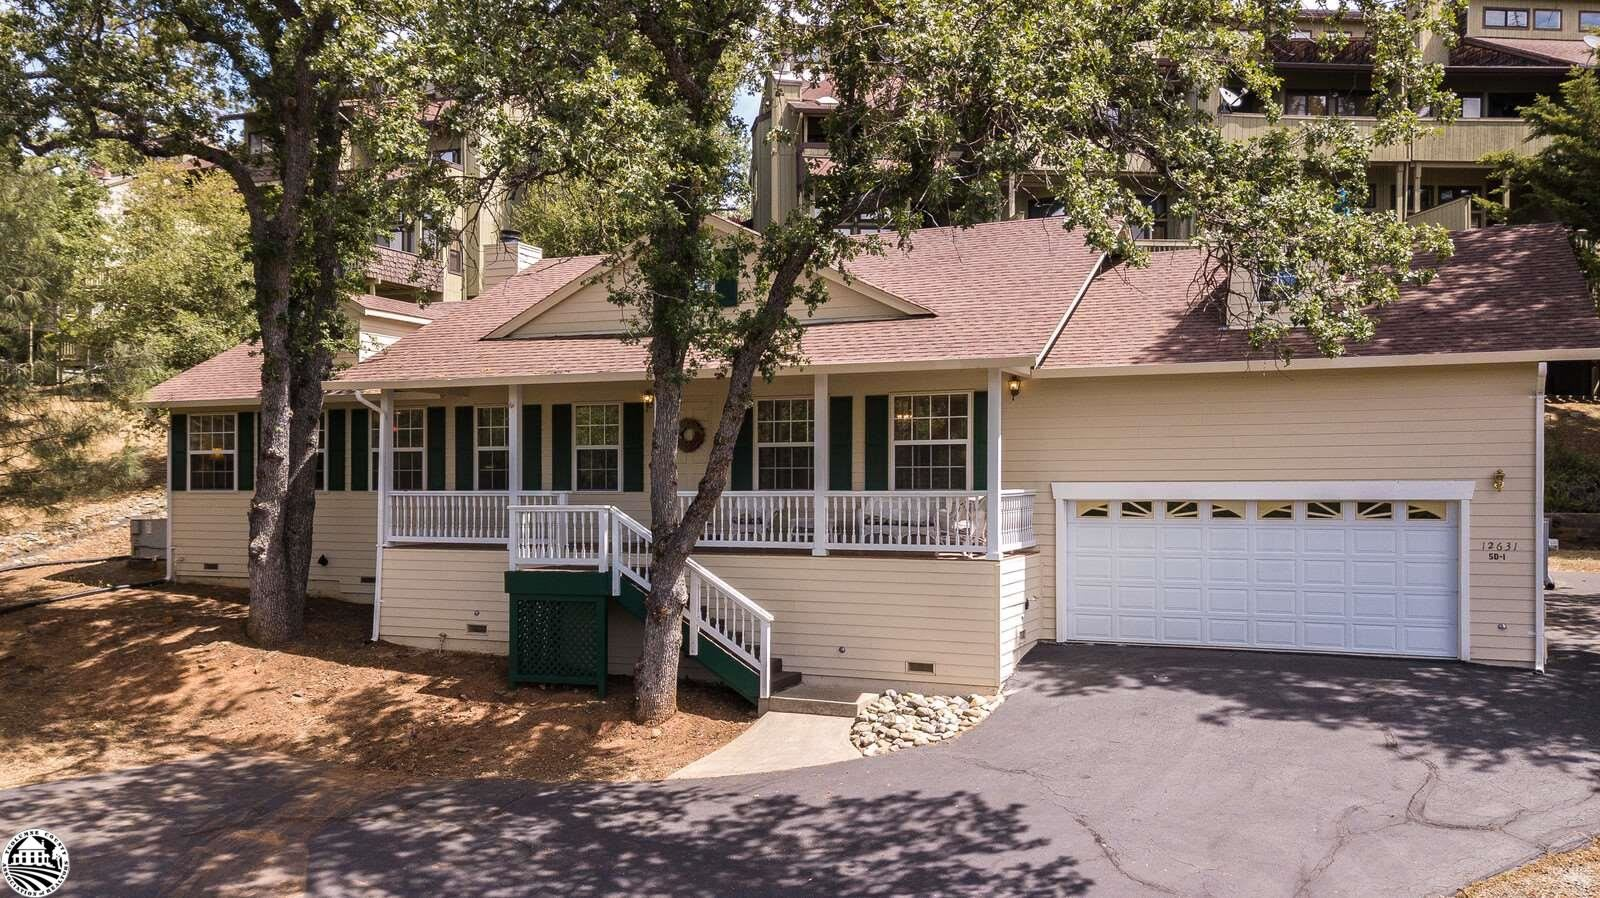 12631 Tannahill Drive Drive, Groveland, CA 95321 - MLS#: 20200784